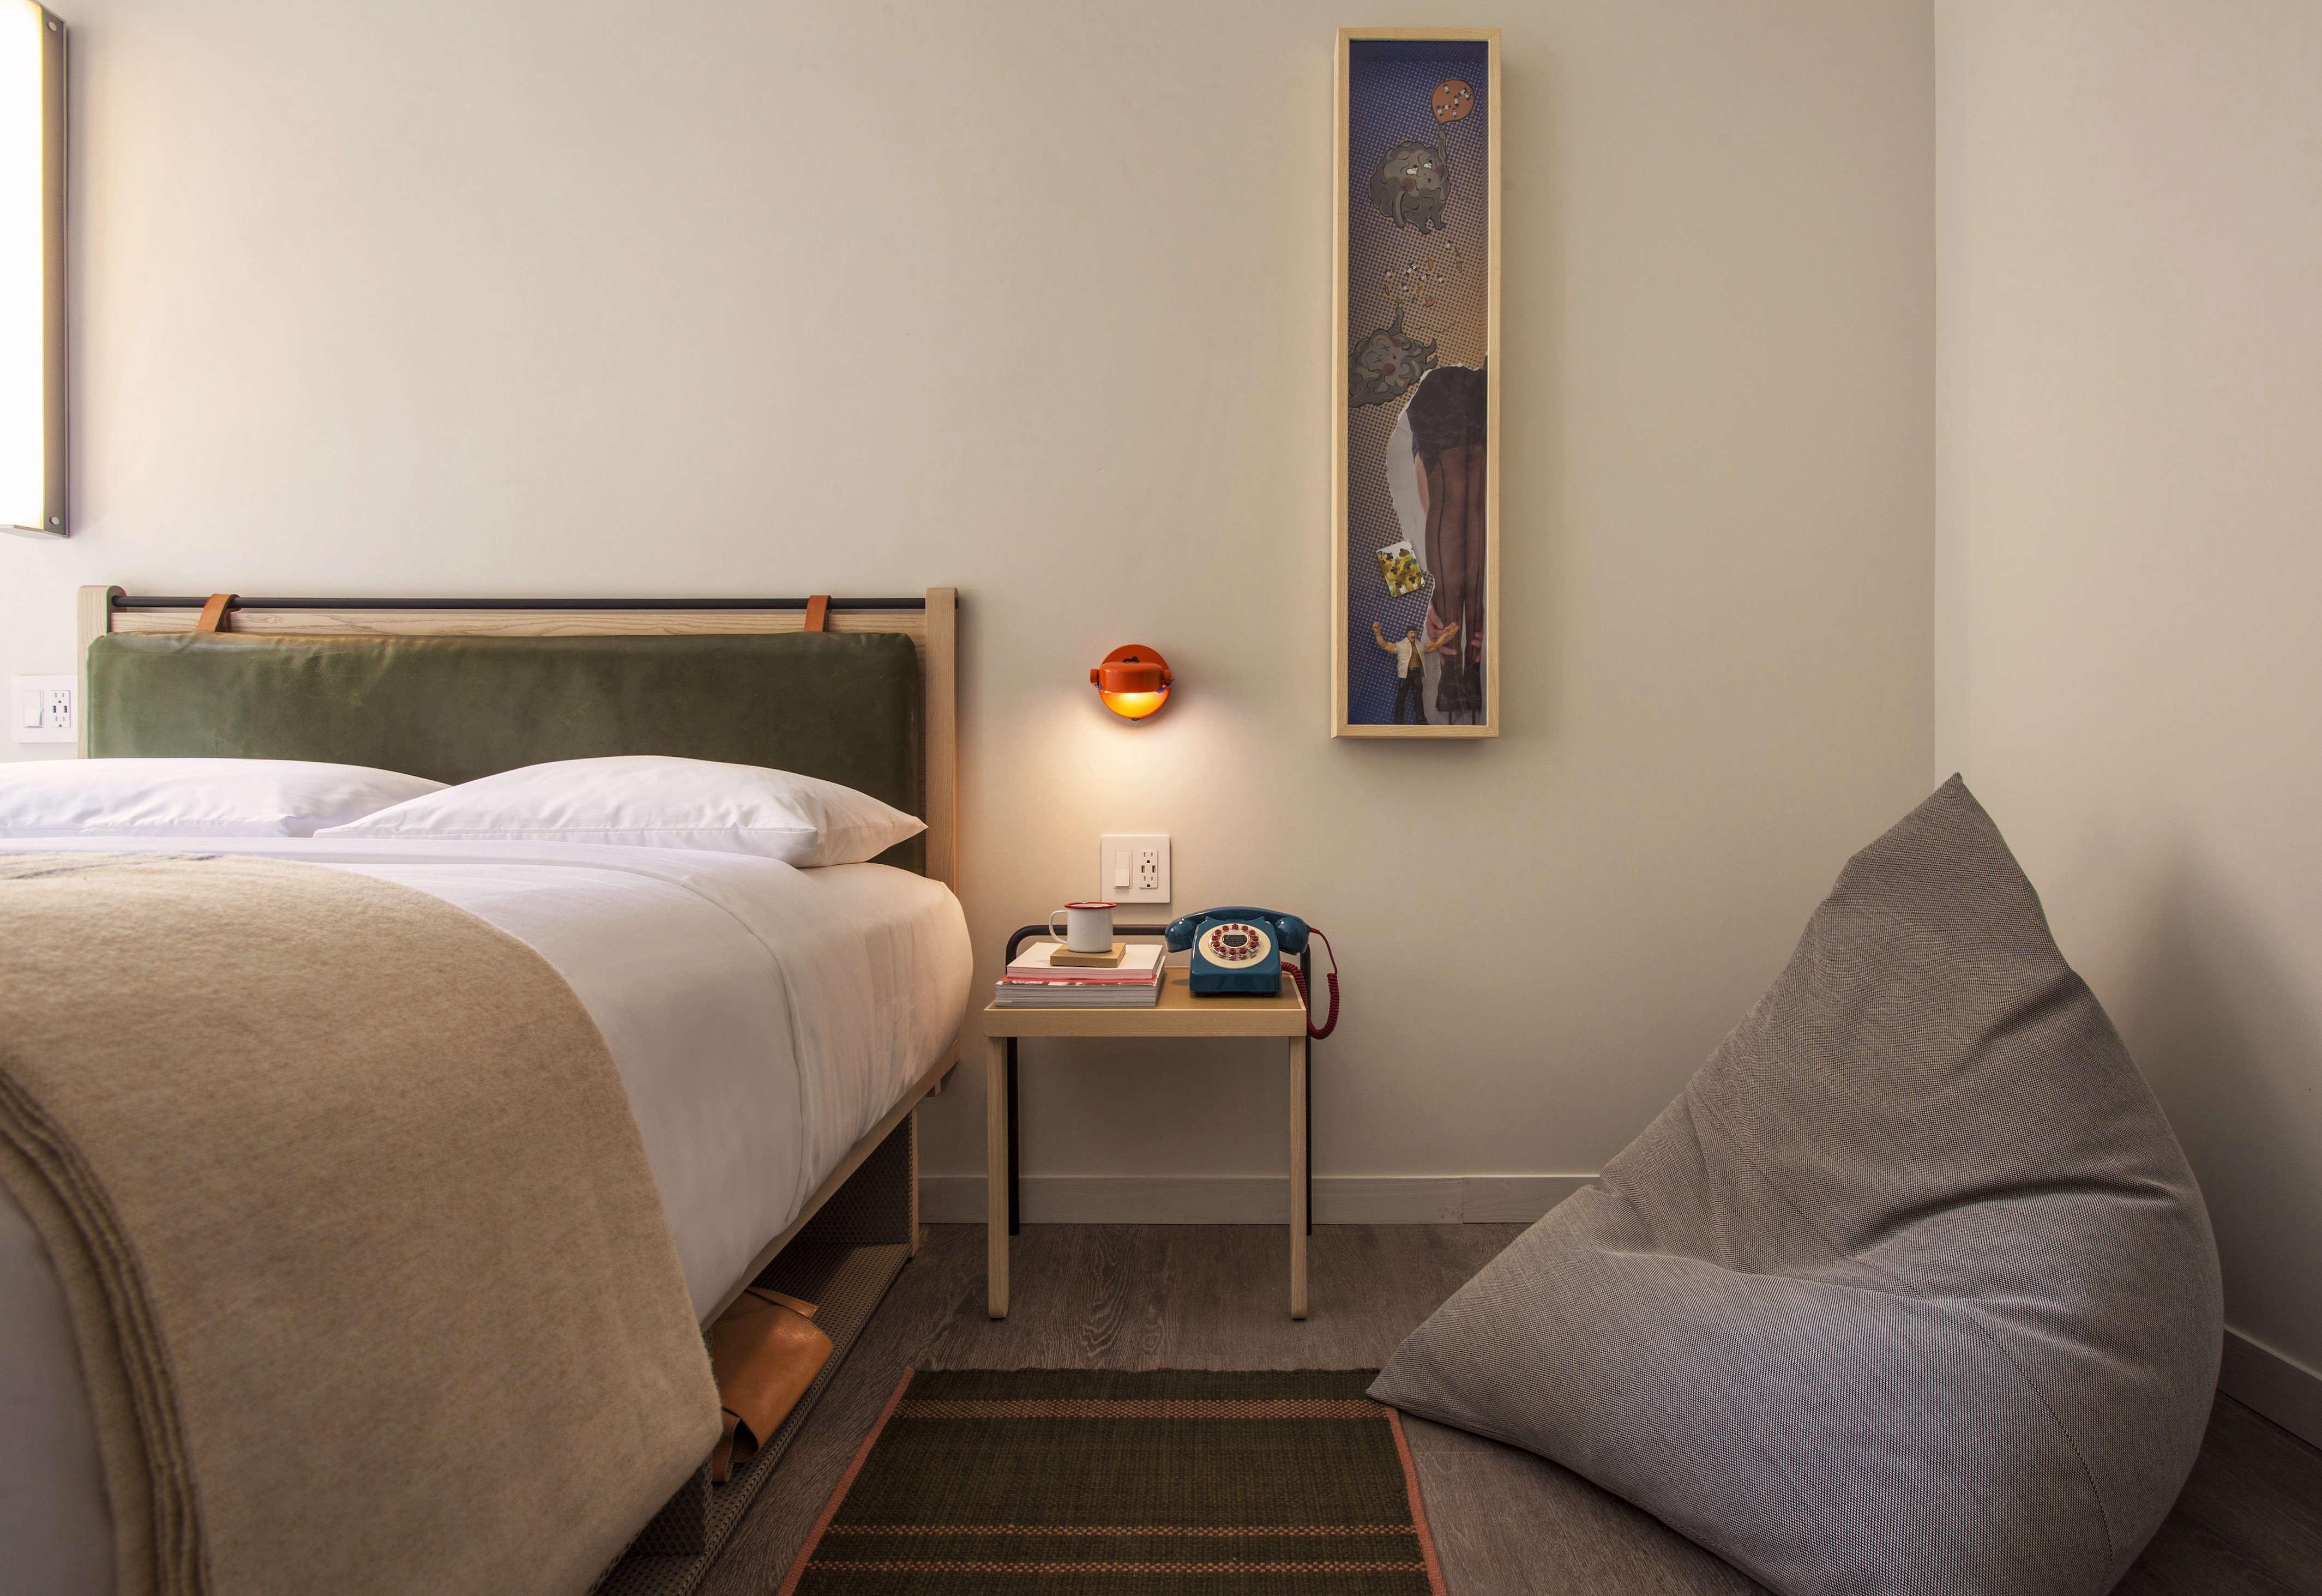 Moxy Hotel NYC, Yabu Pushelberg design.